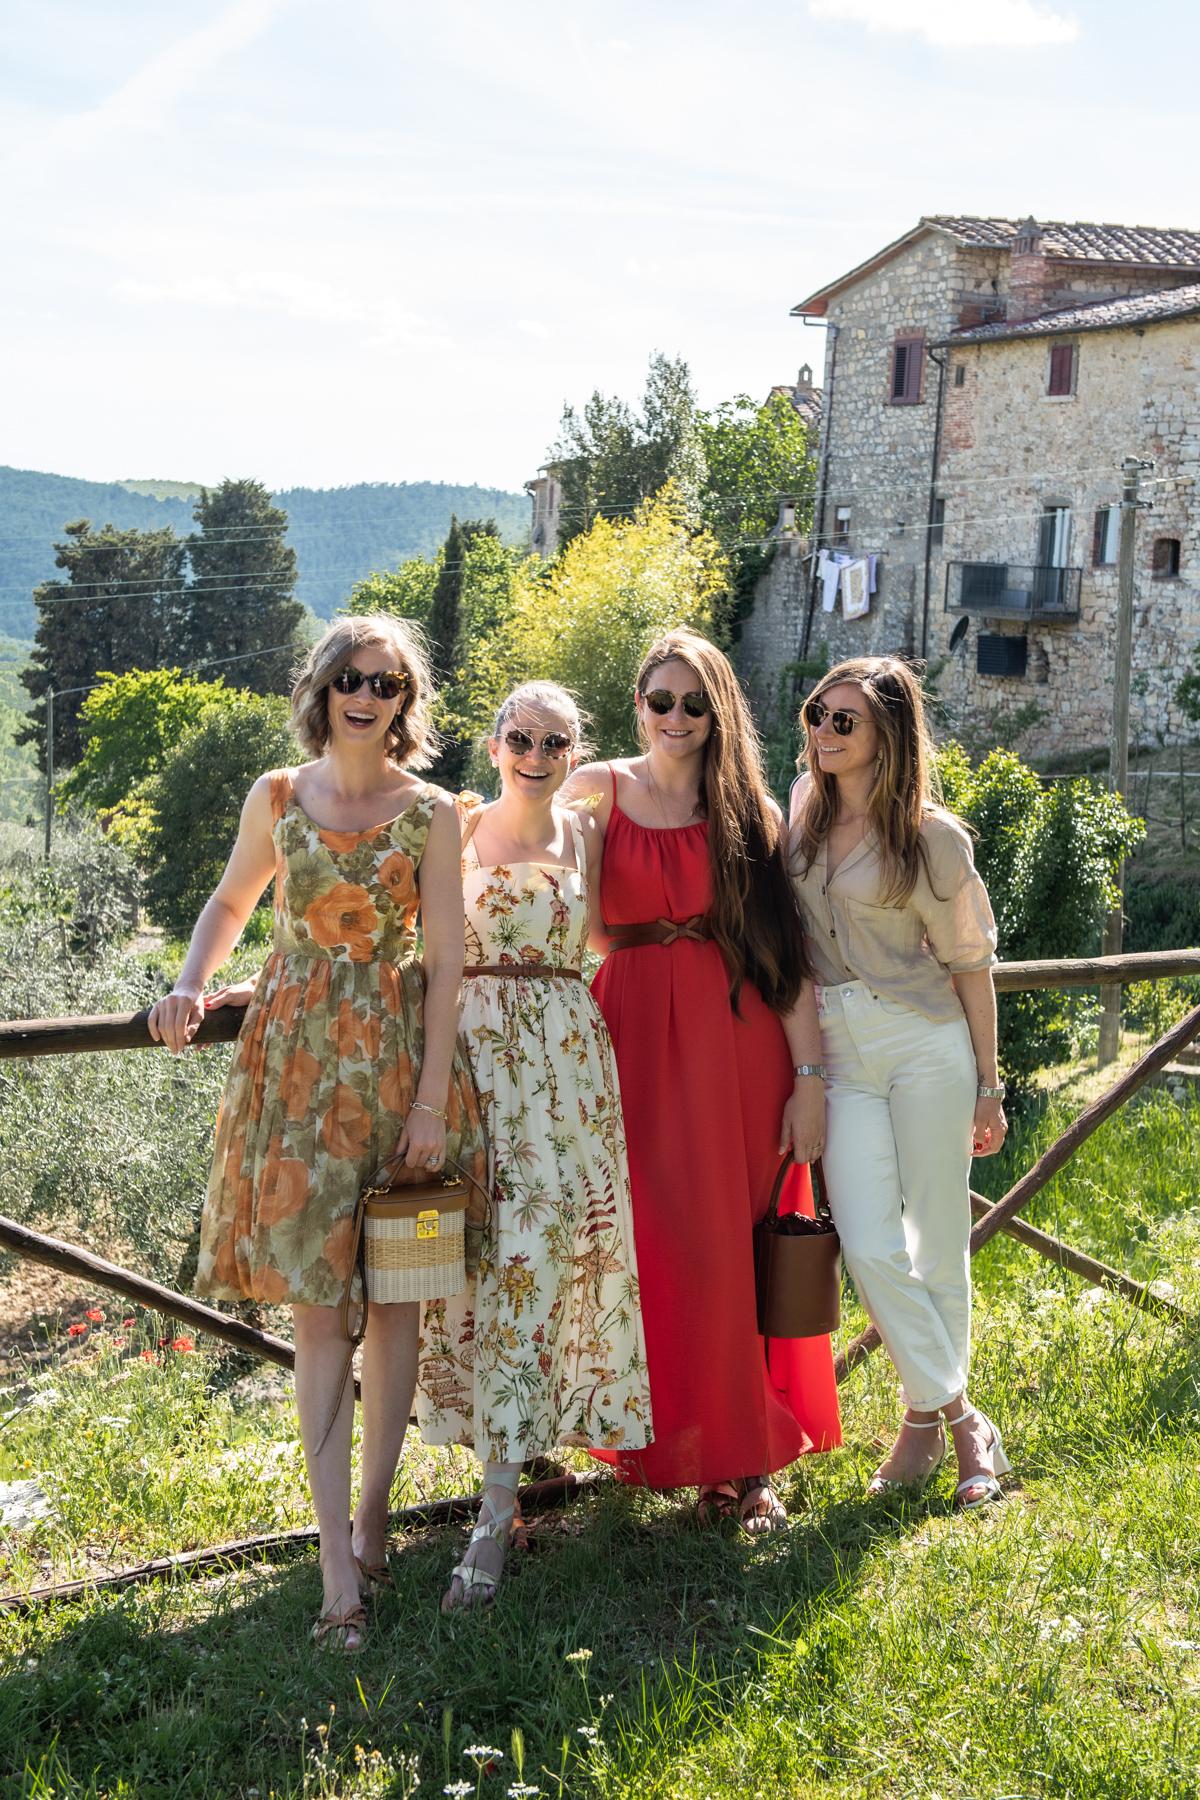 Stacie Flinner x Cuvee Tuscan Farmhouse Tuscany Italy Guide-74.jpg